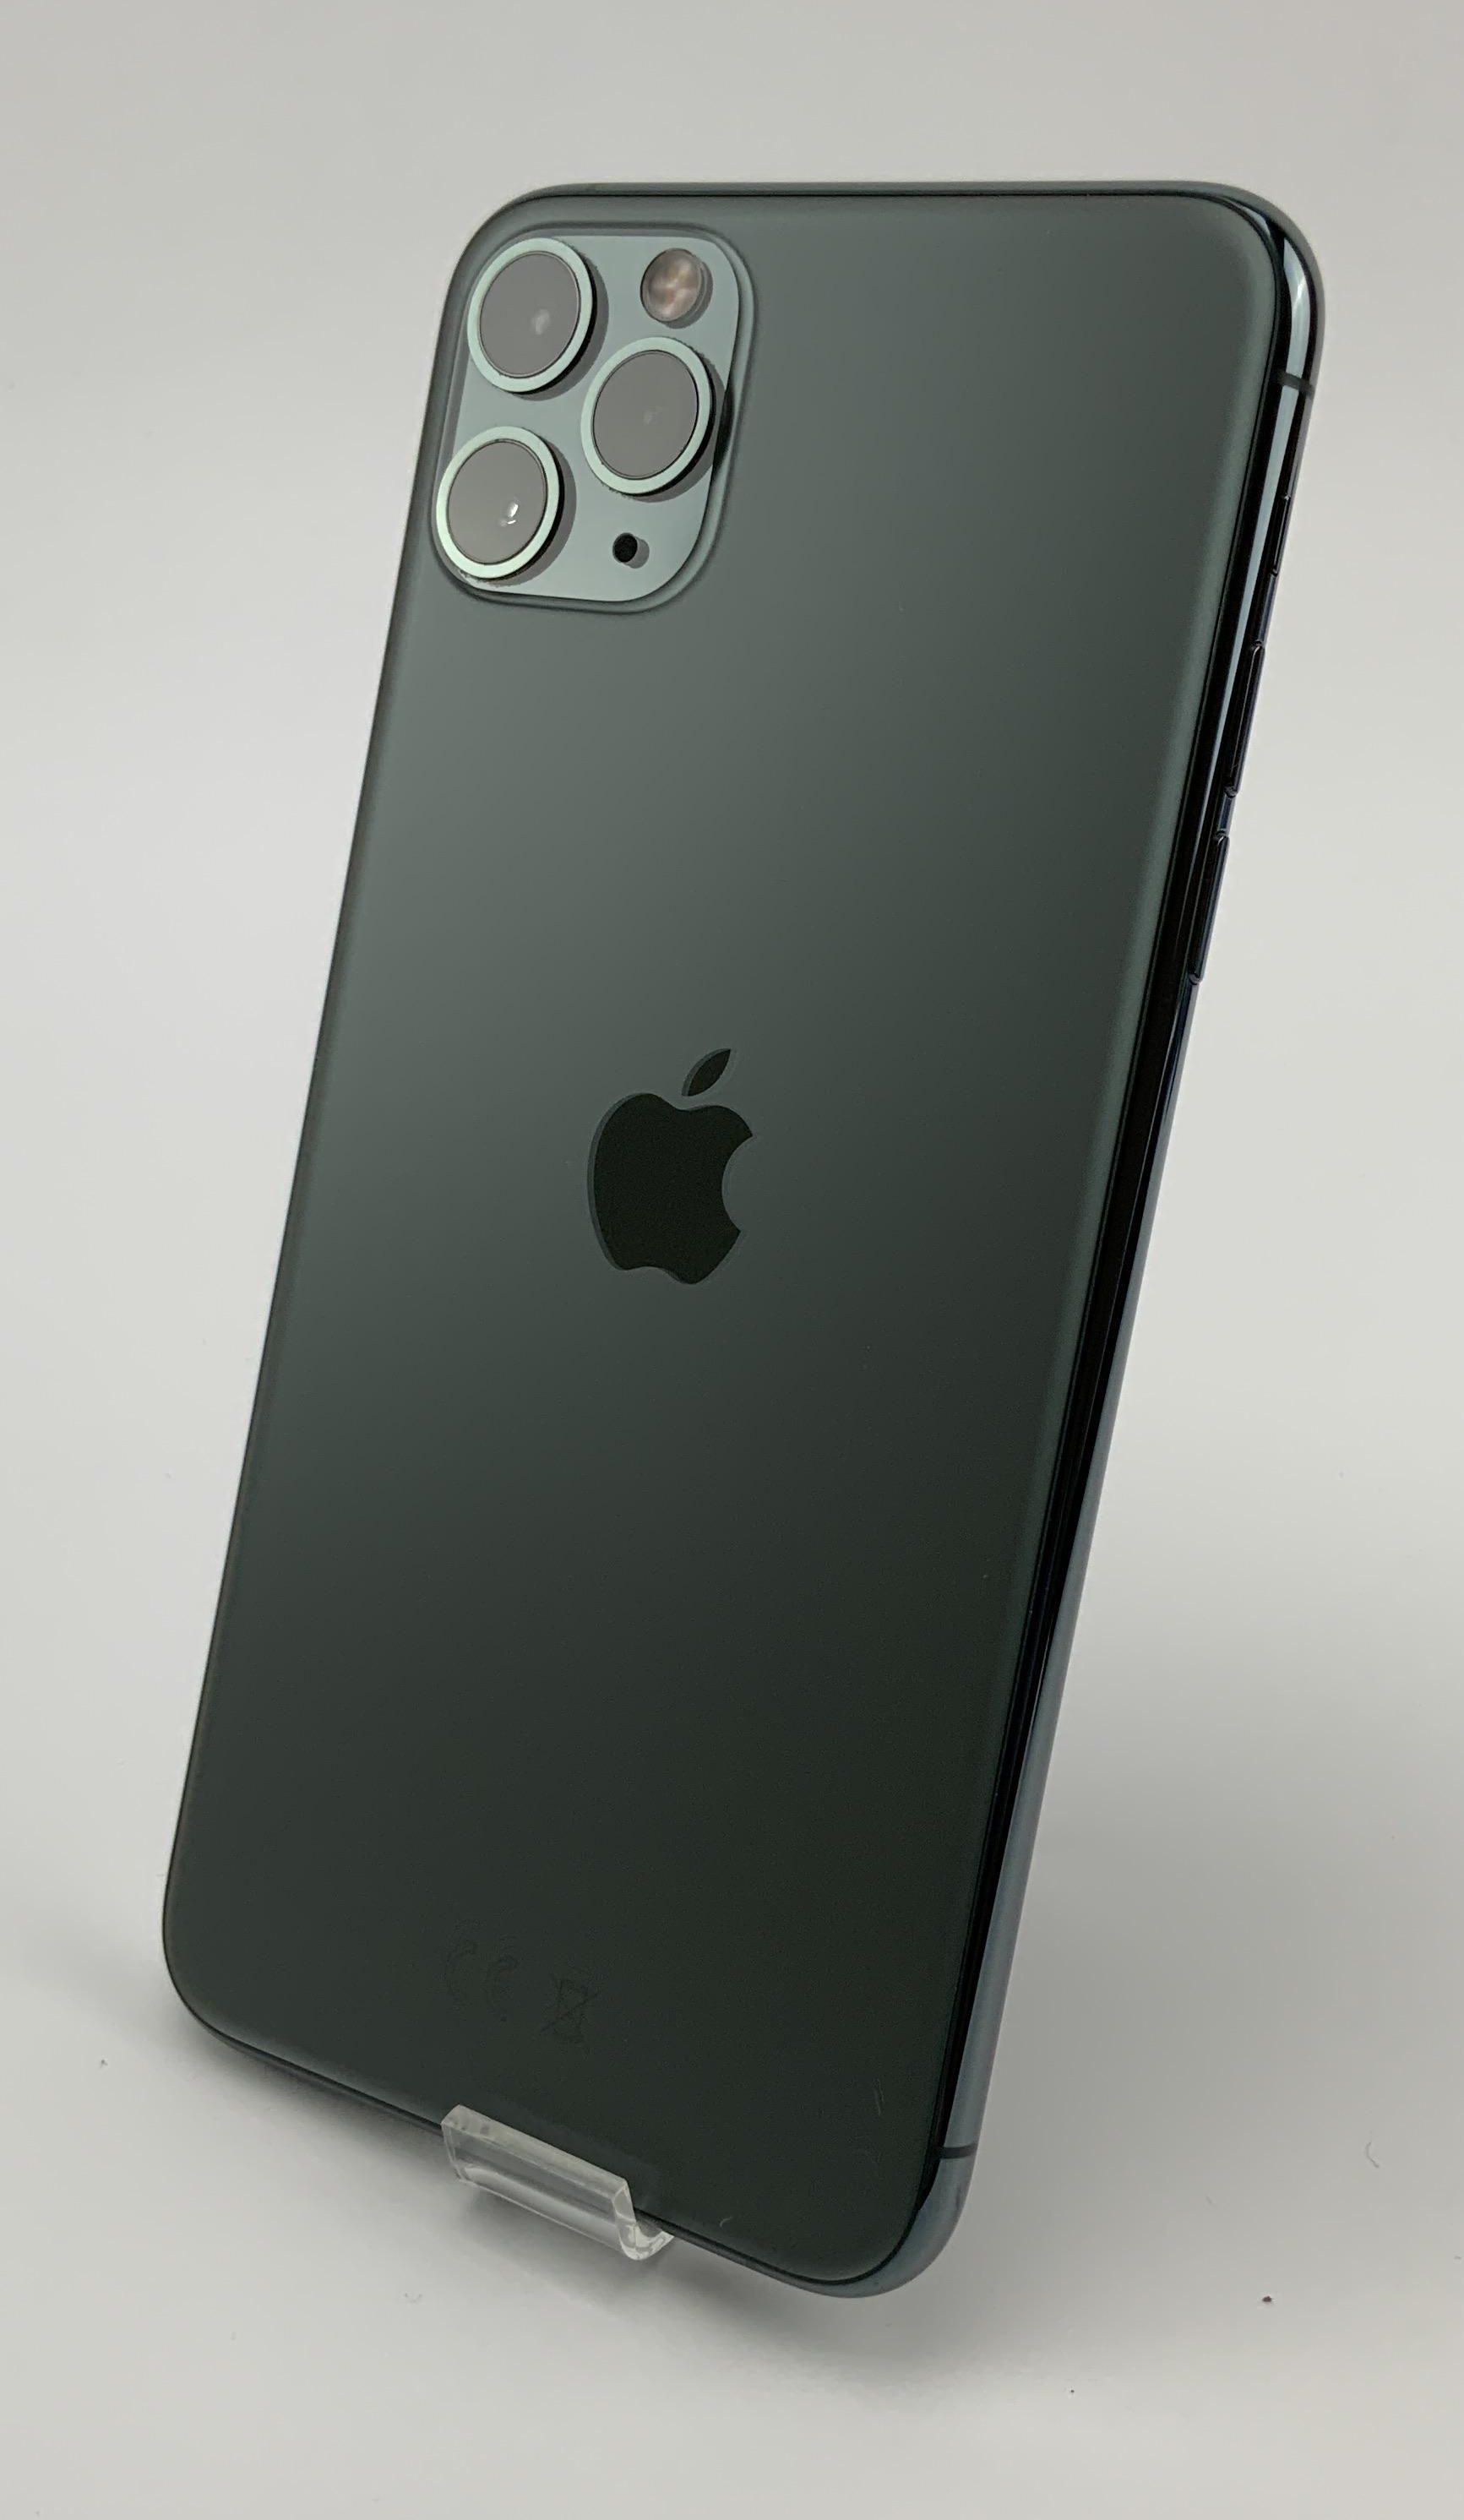 iPhone 11 Pro Max 64GB, 64GB, Midnight Green, imagen 4